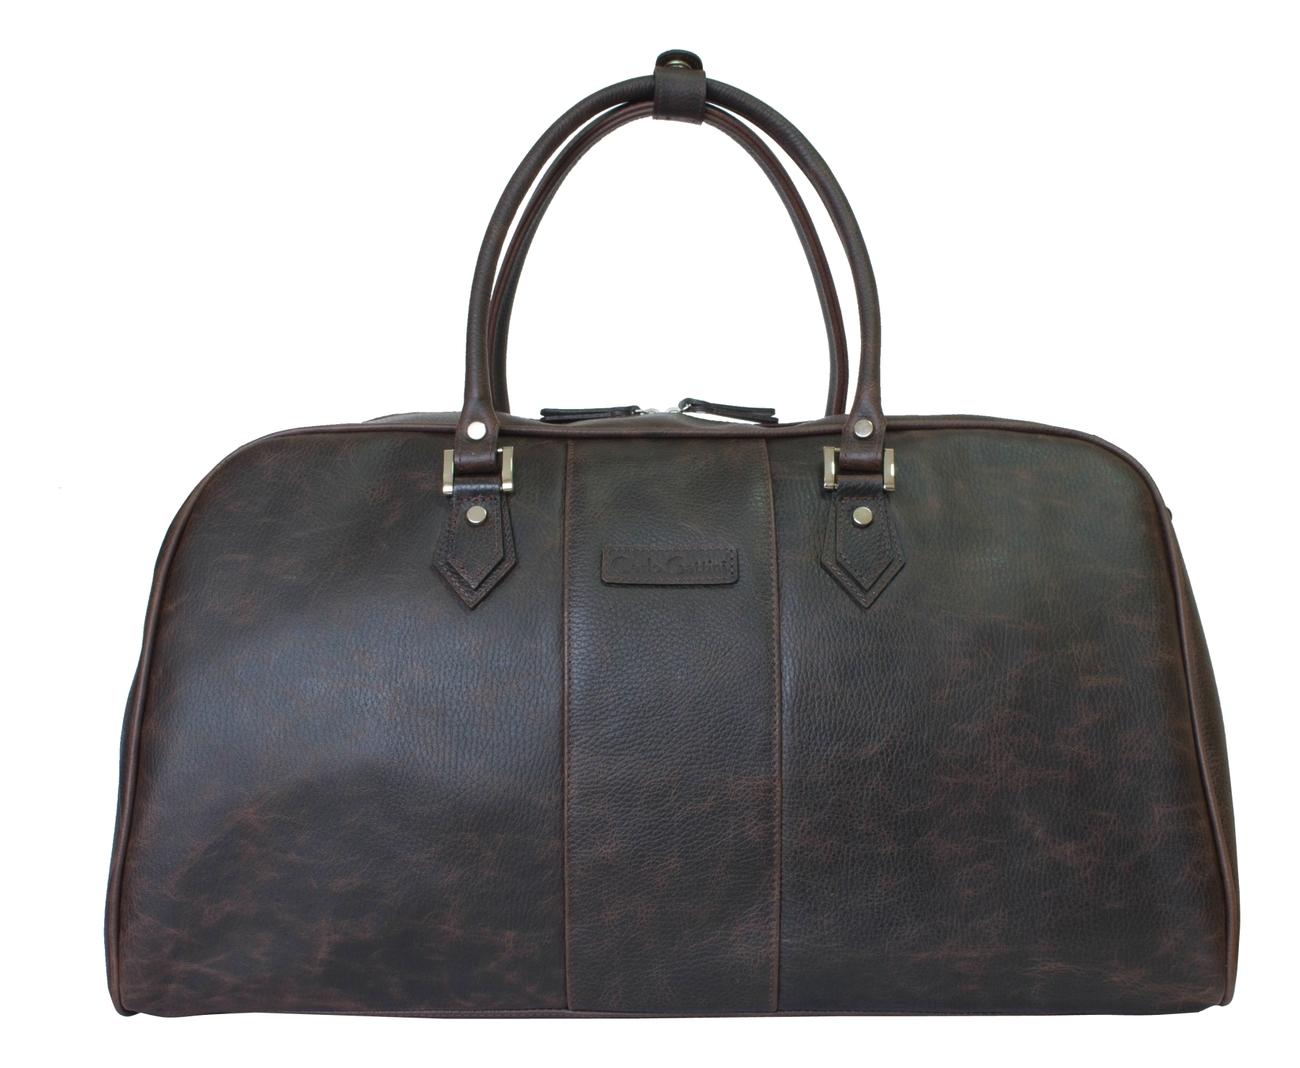 Дорожная сумка Normanno Brown 4007-02 кожаная дорожная сумка carlo gattini normanno 4007 4007 01